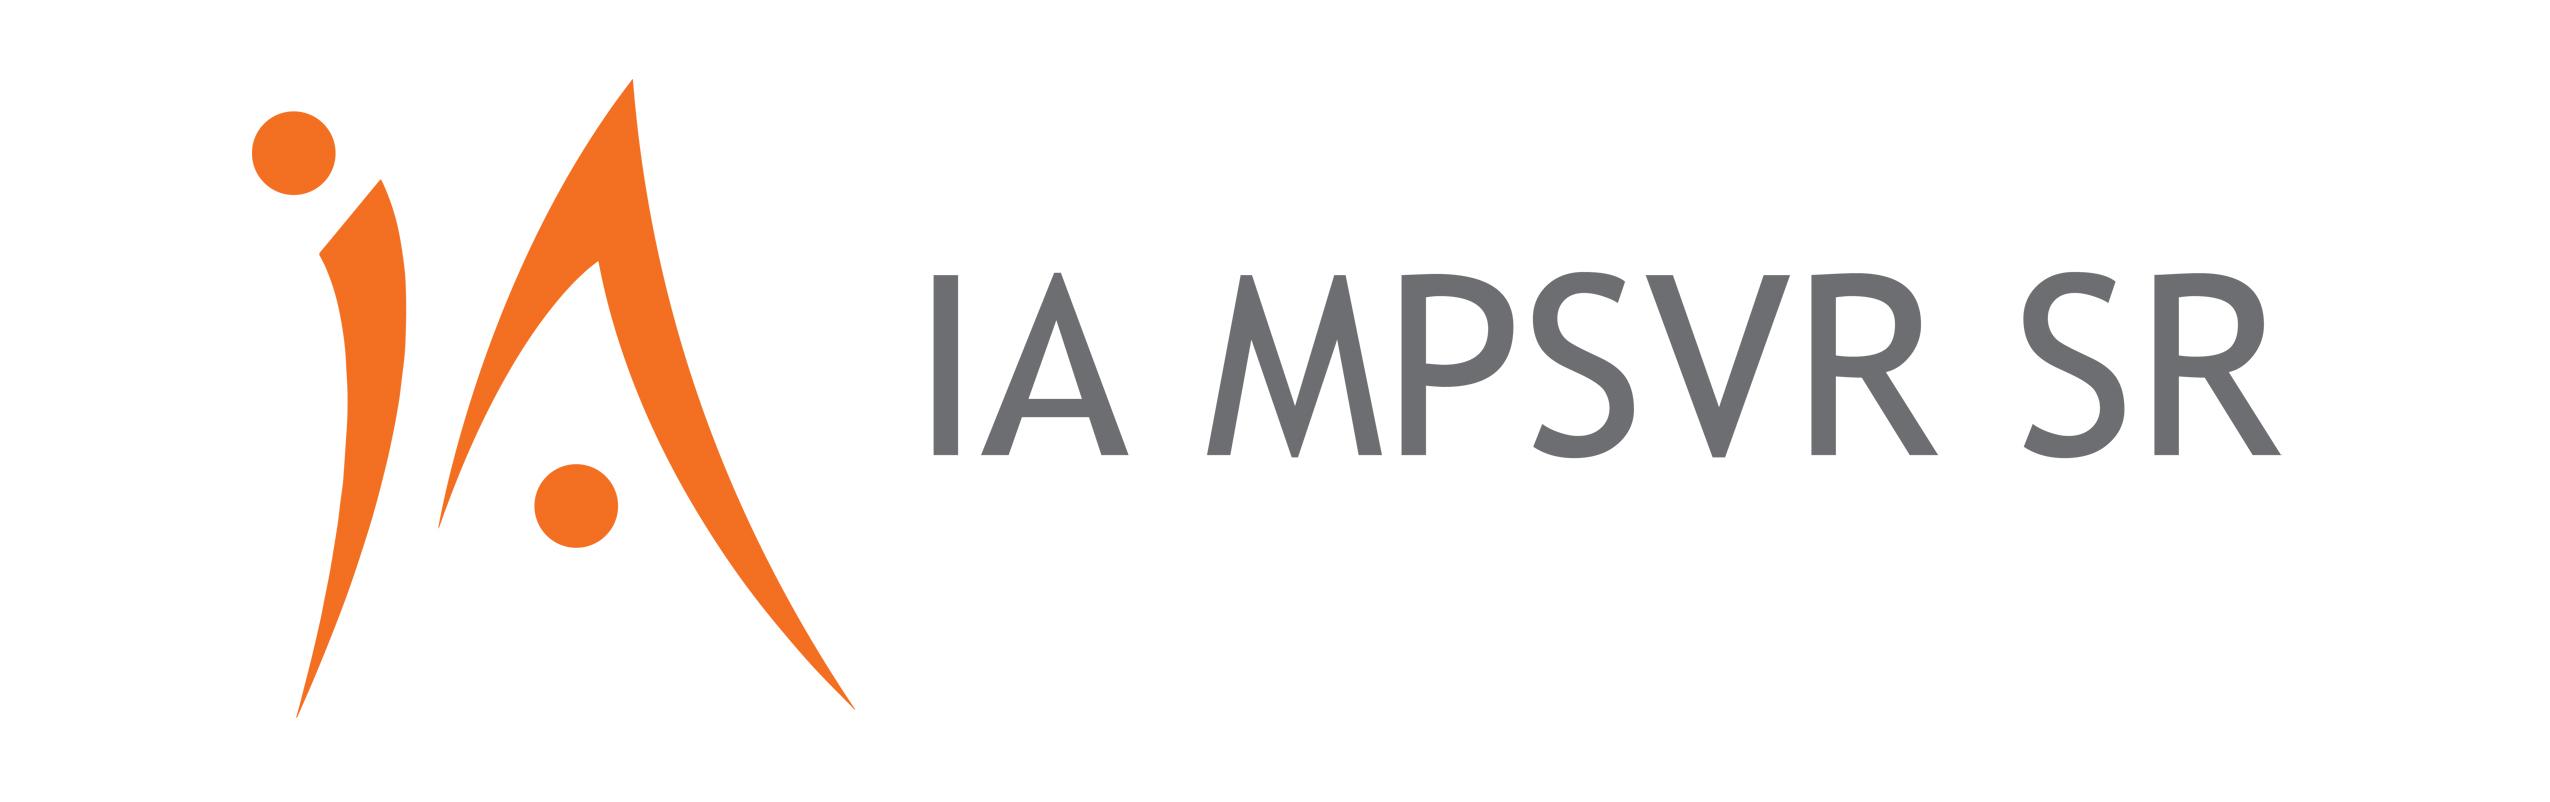 IA_MPSVR_SR_2.jpg